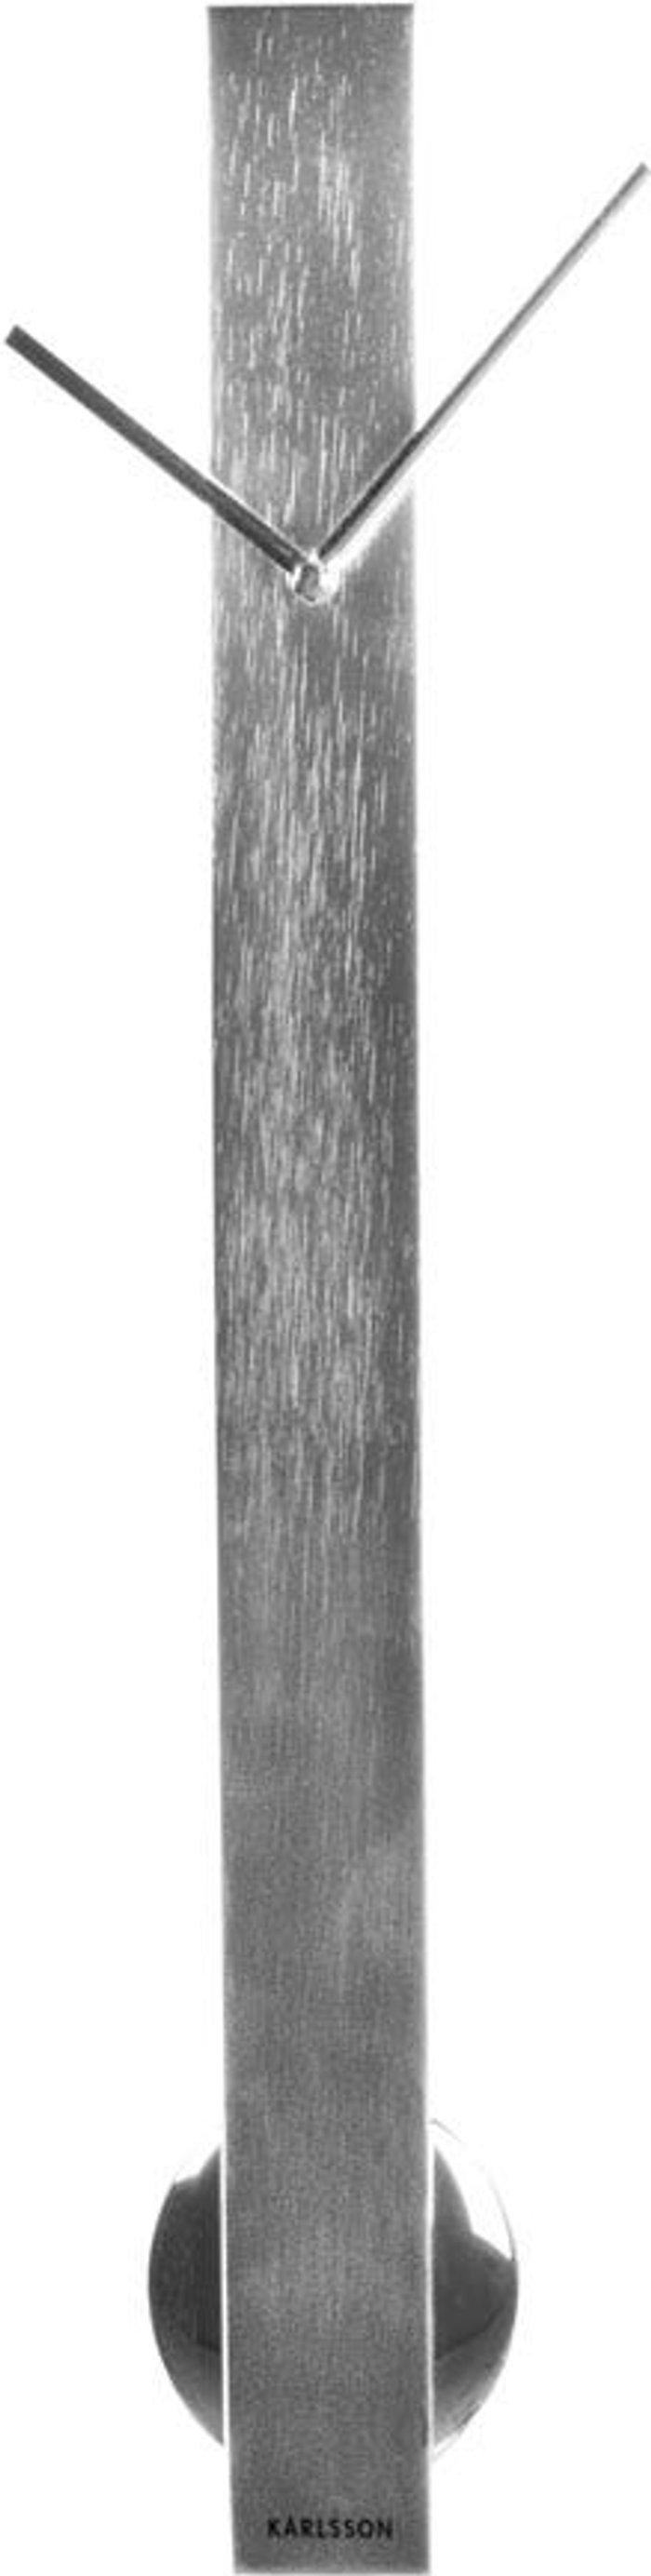 Karlsson Karlsson Pendulum Wall Clock - Silver